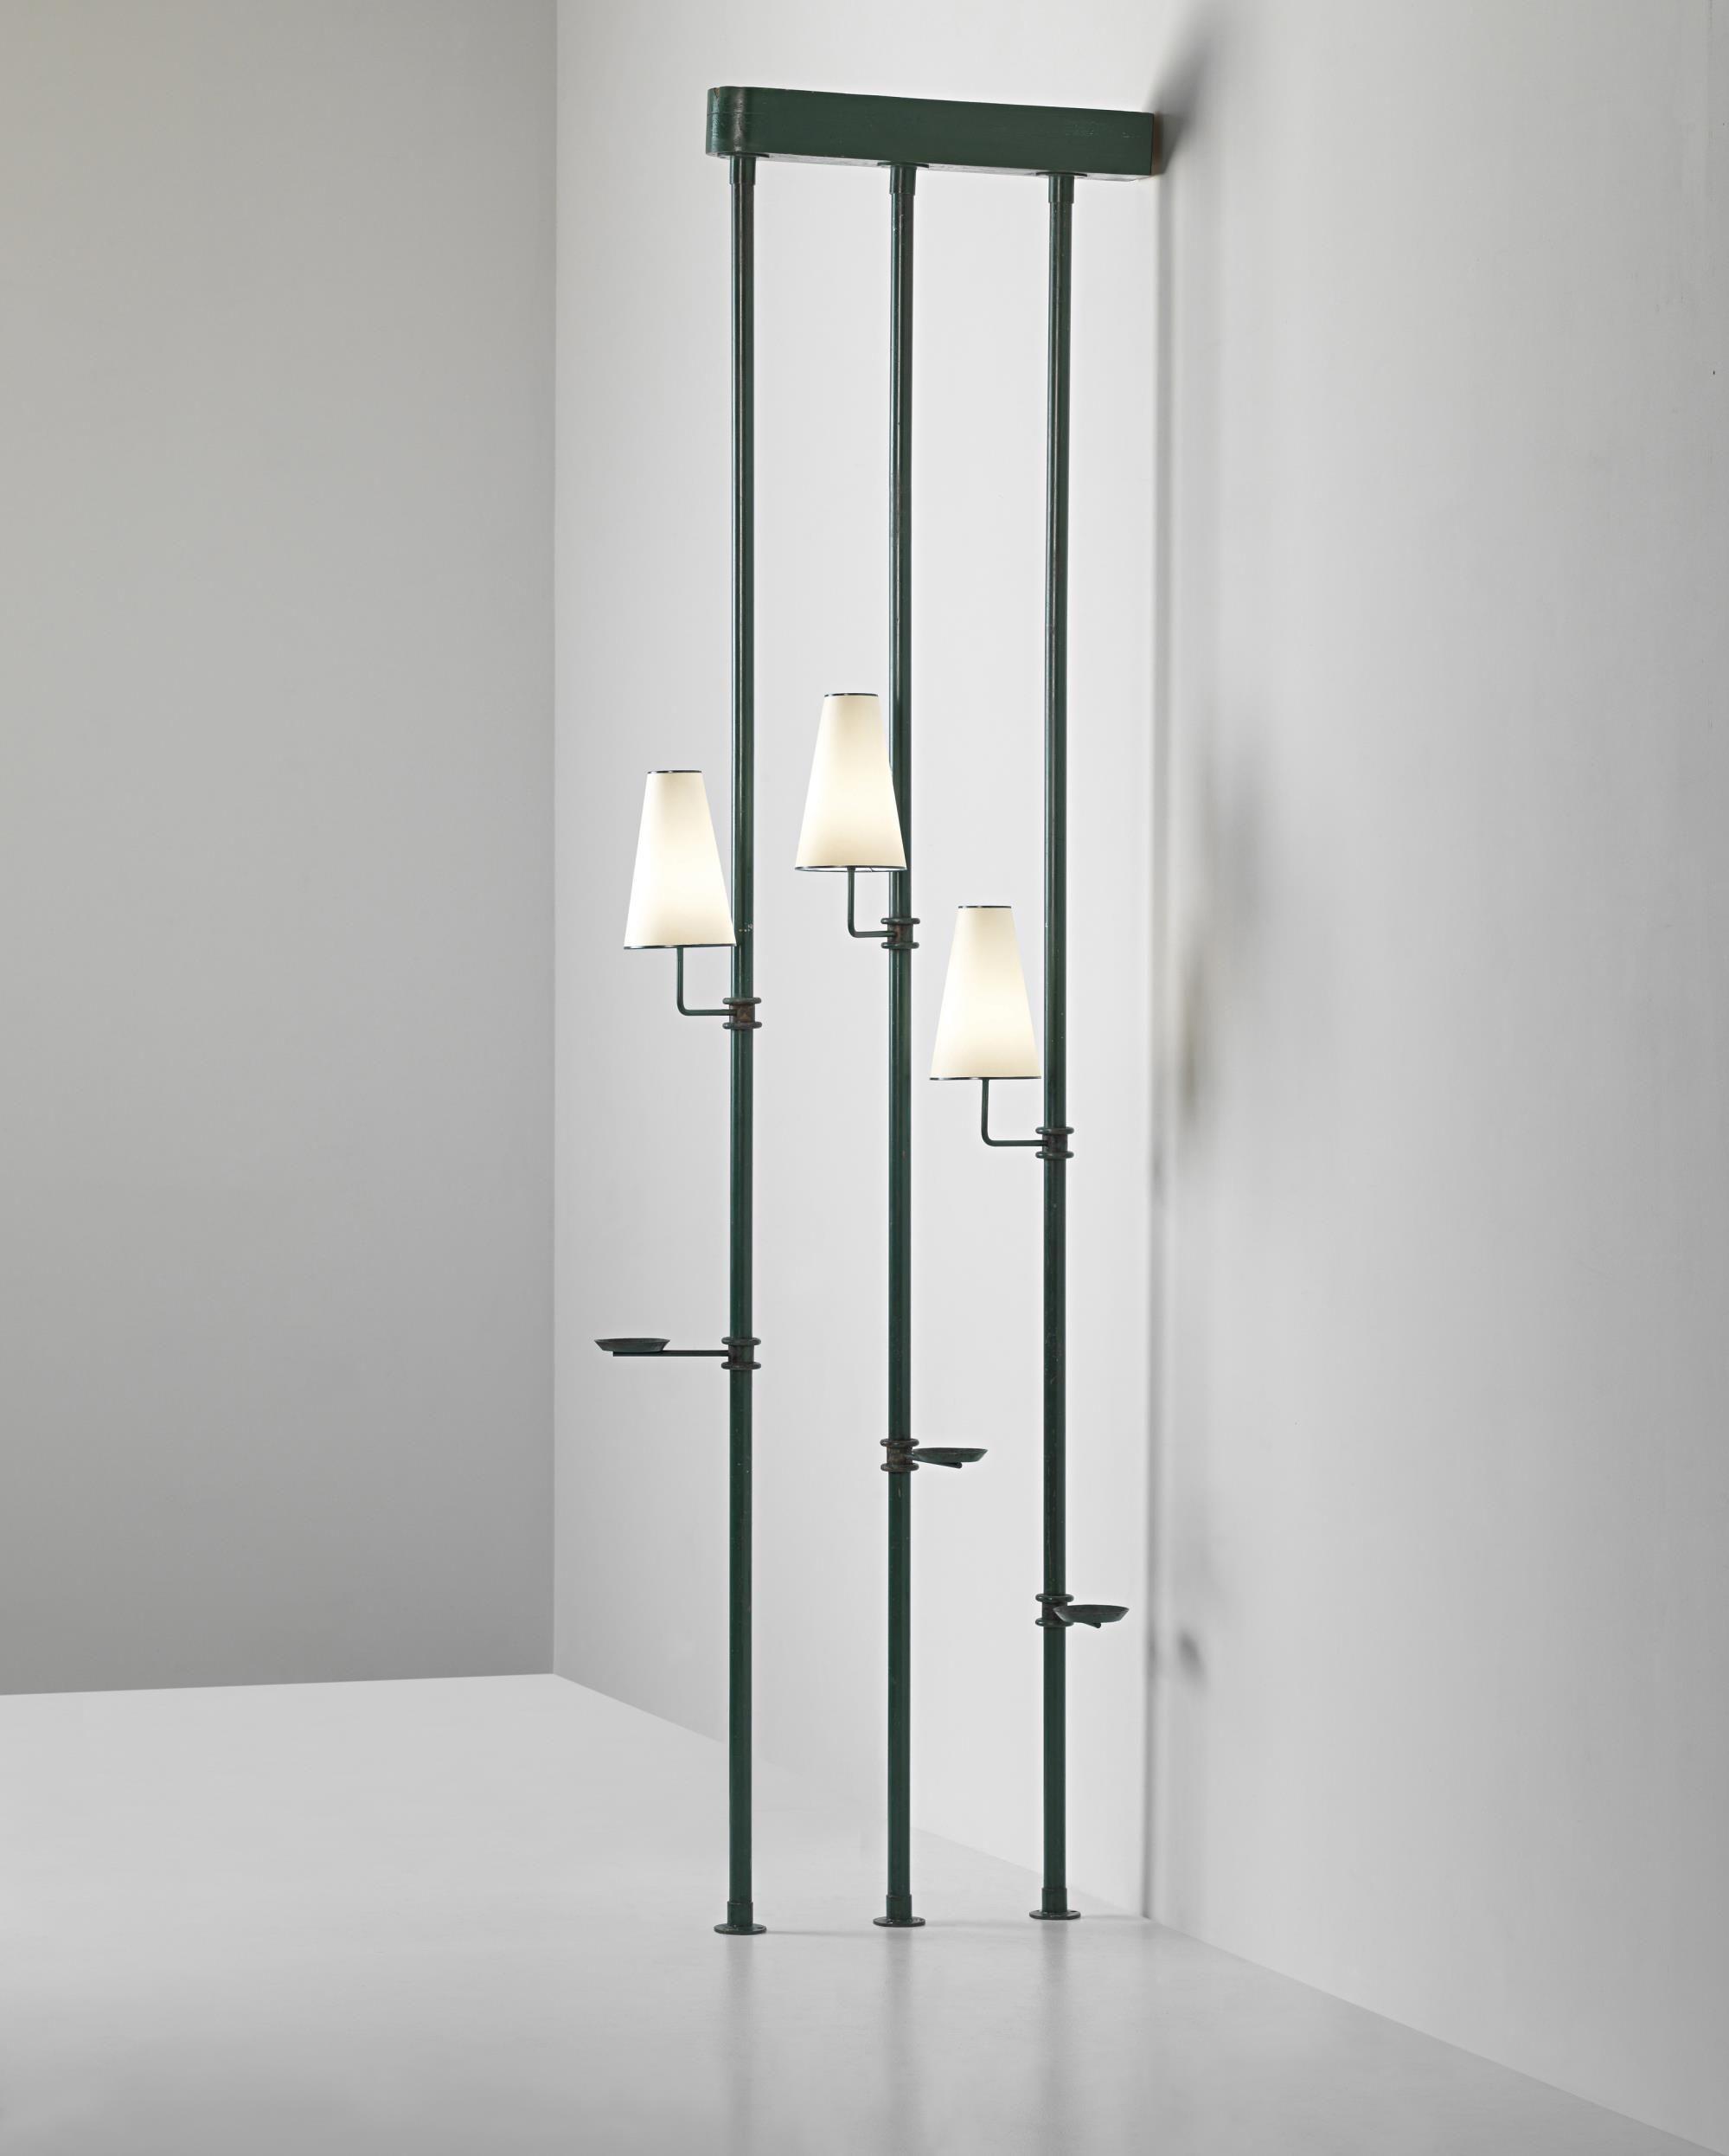 illuminated room divider - illuminated room divider